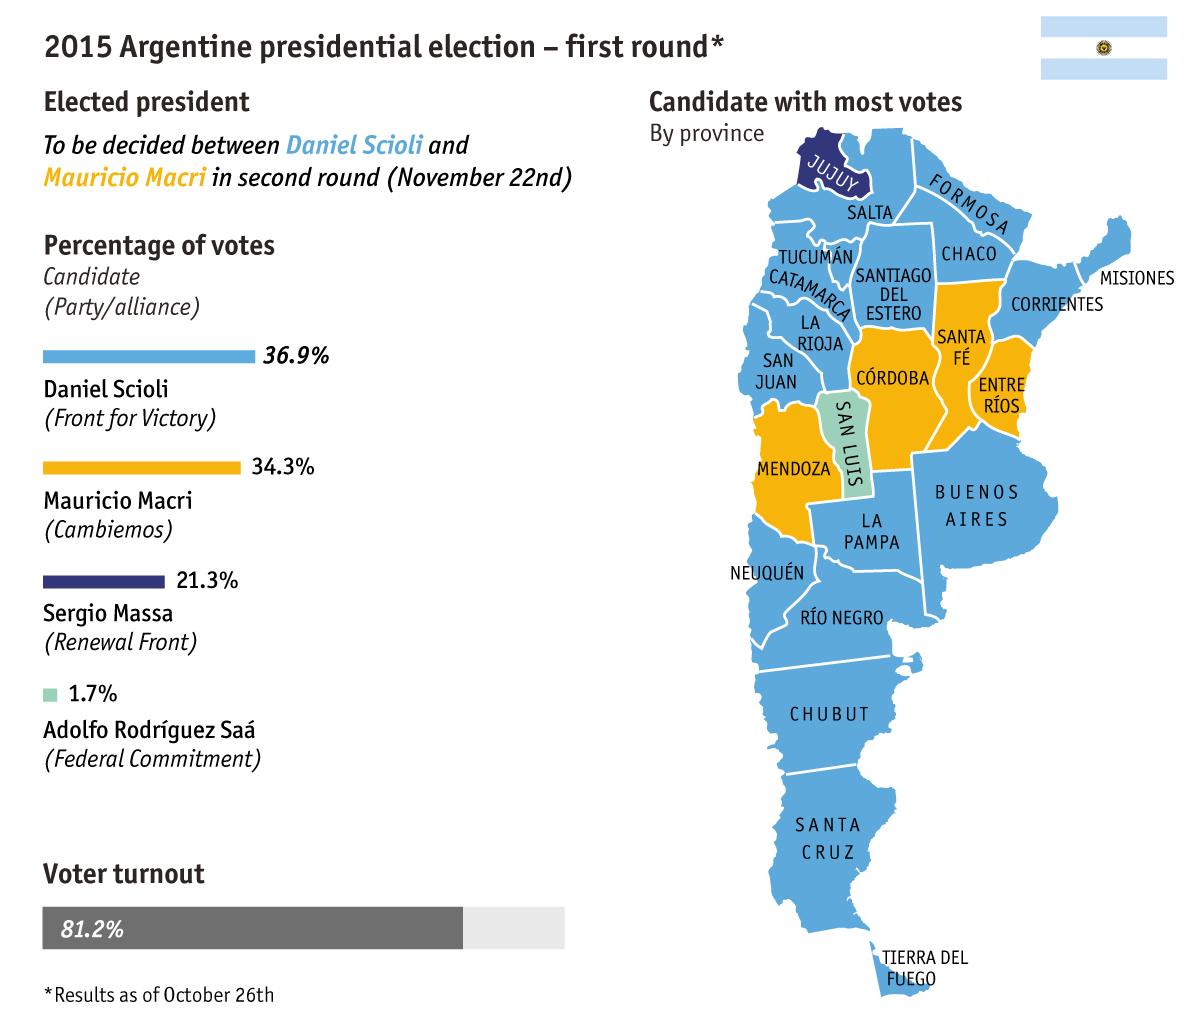 2015 Argentine presidential election secondround result Mauricio